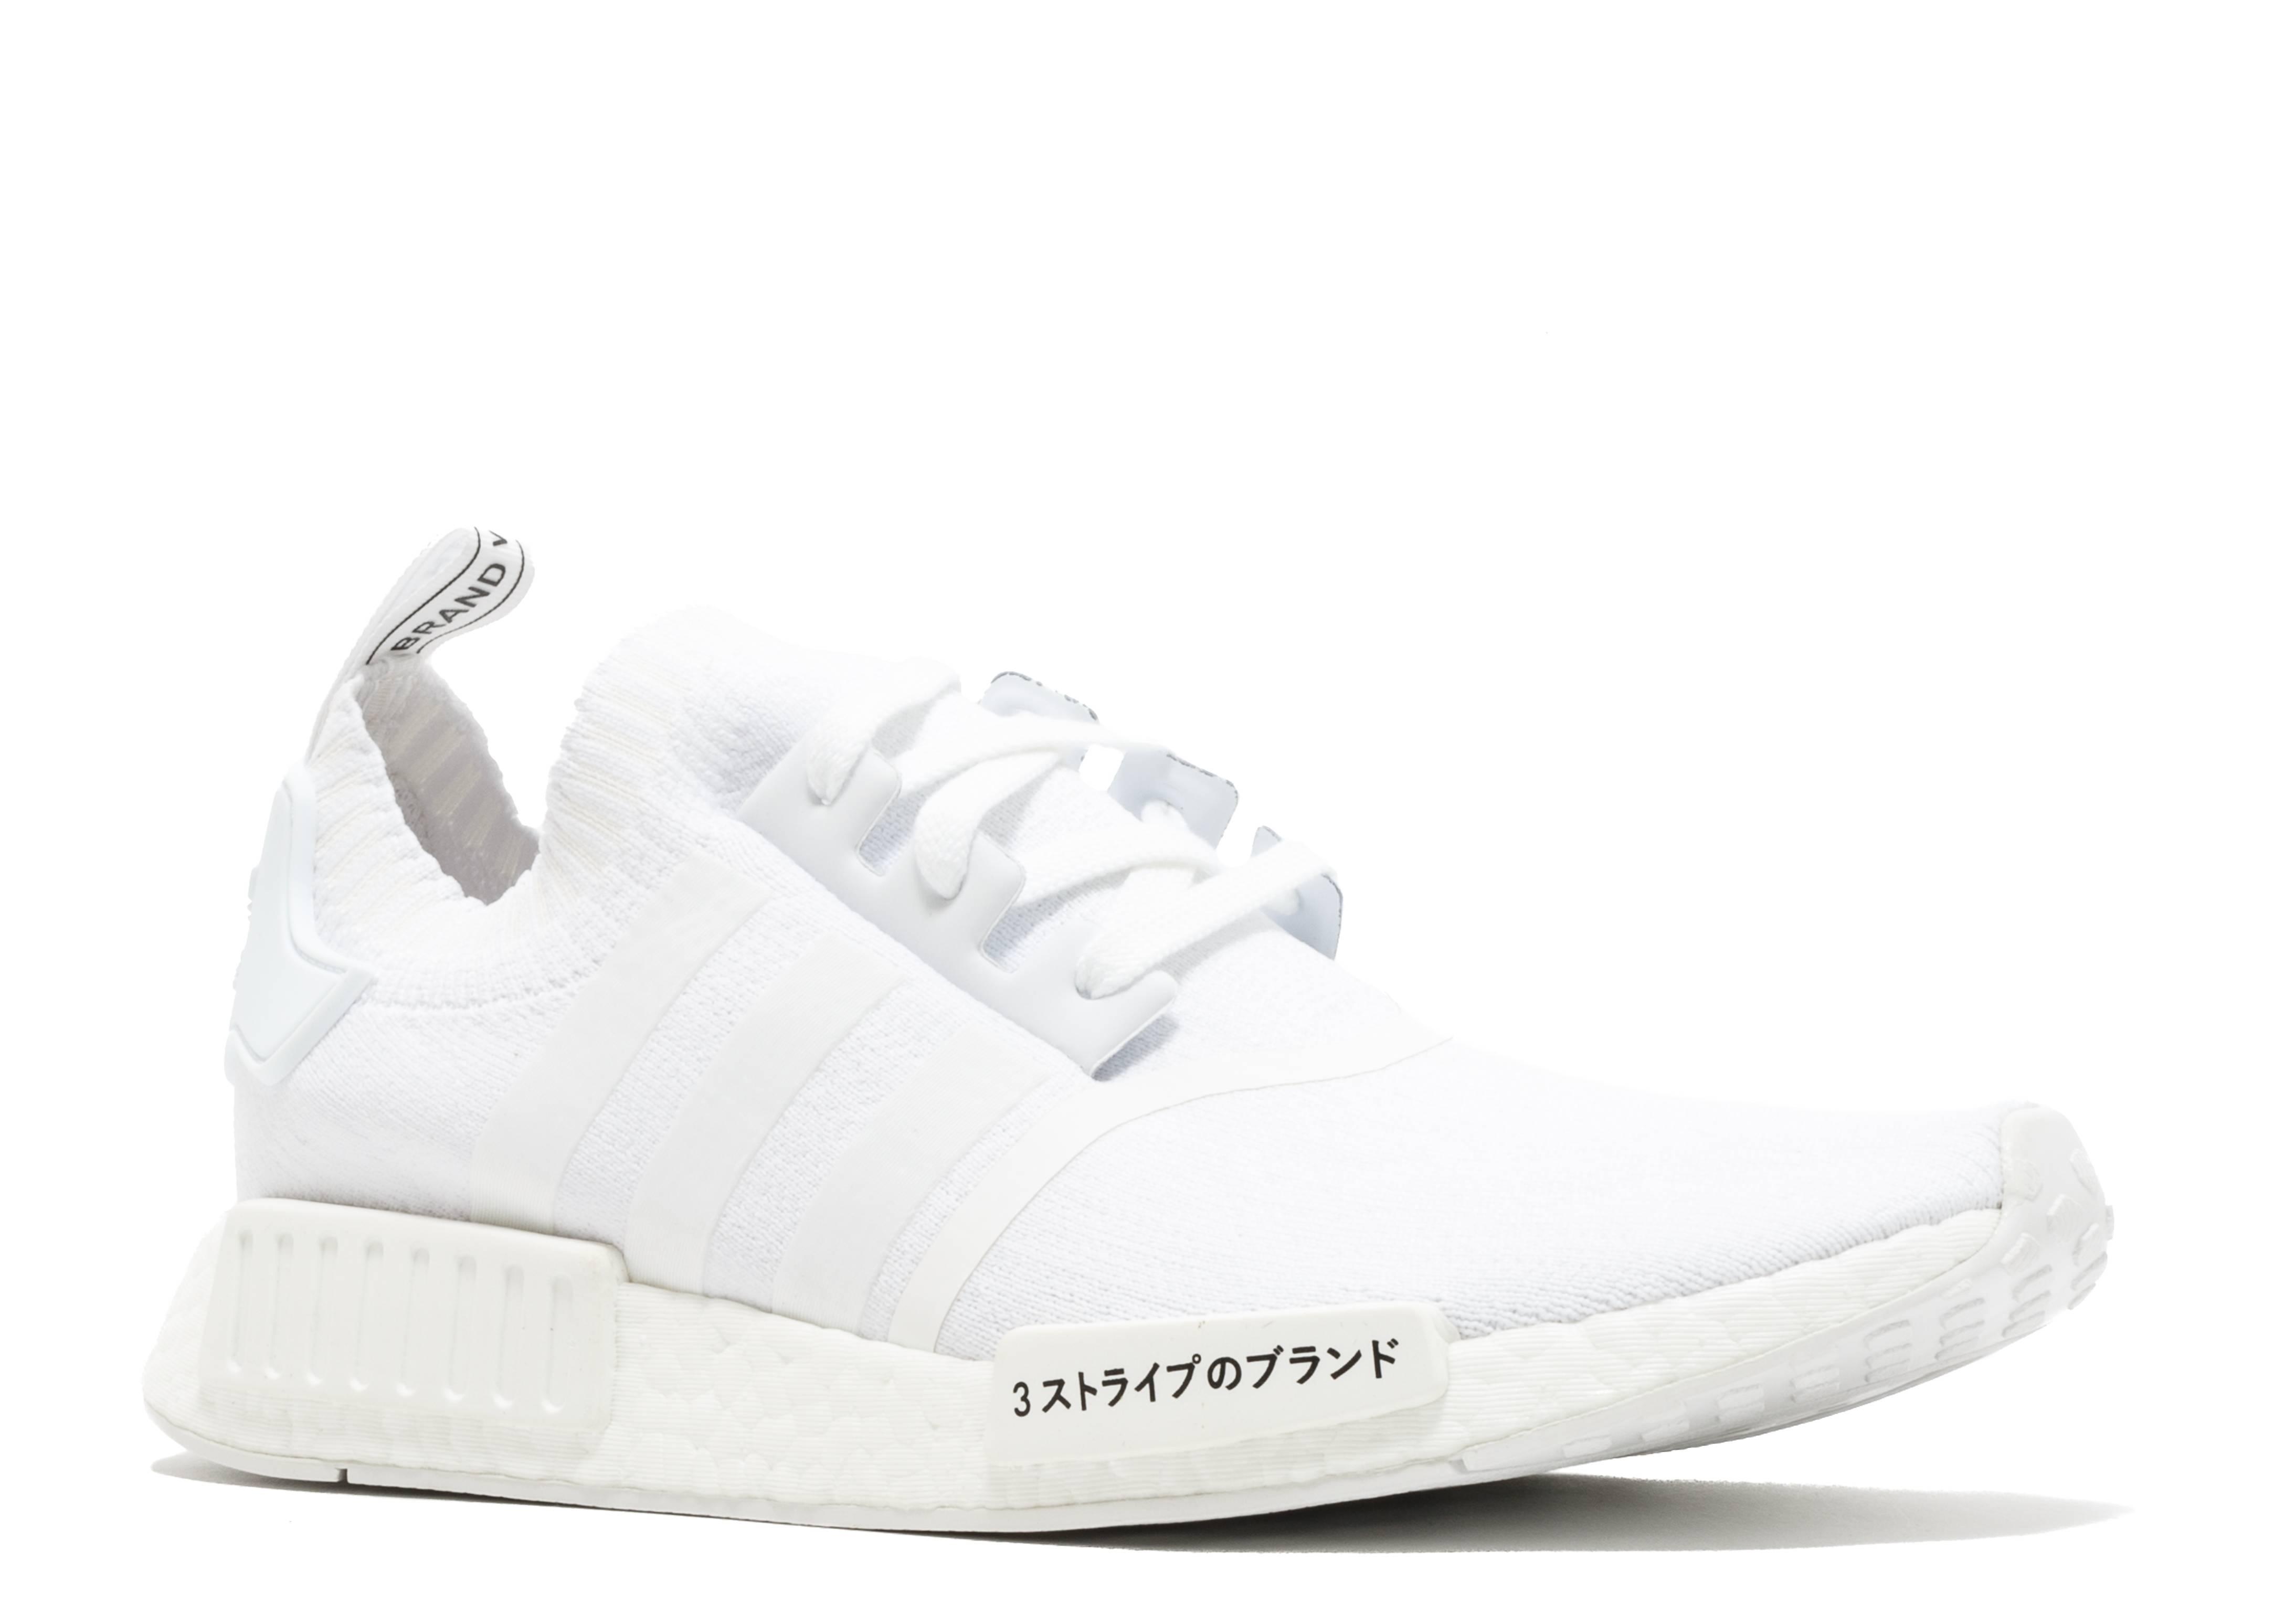 2eecdf58f2c4d Adidas NMD R1 Japan Triple White - 1